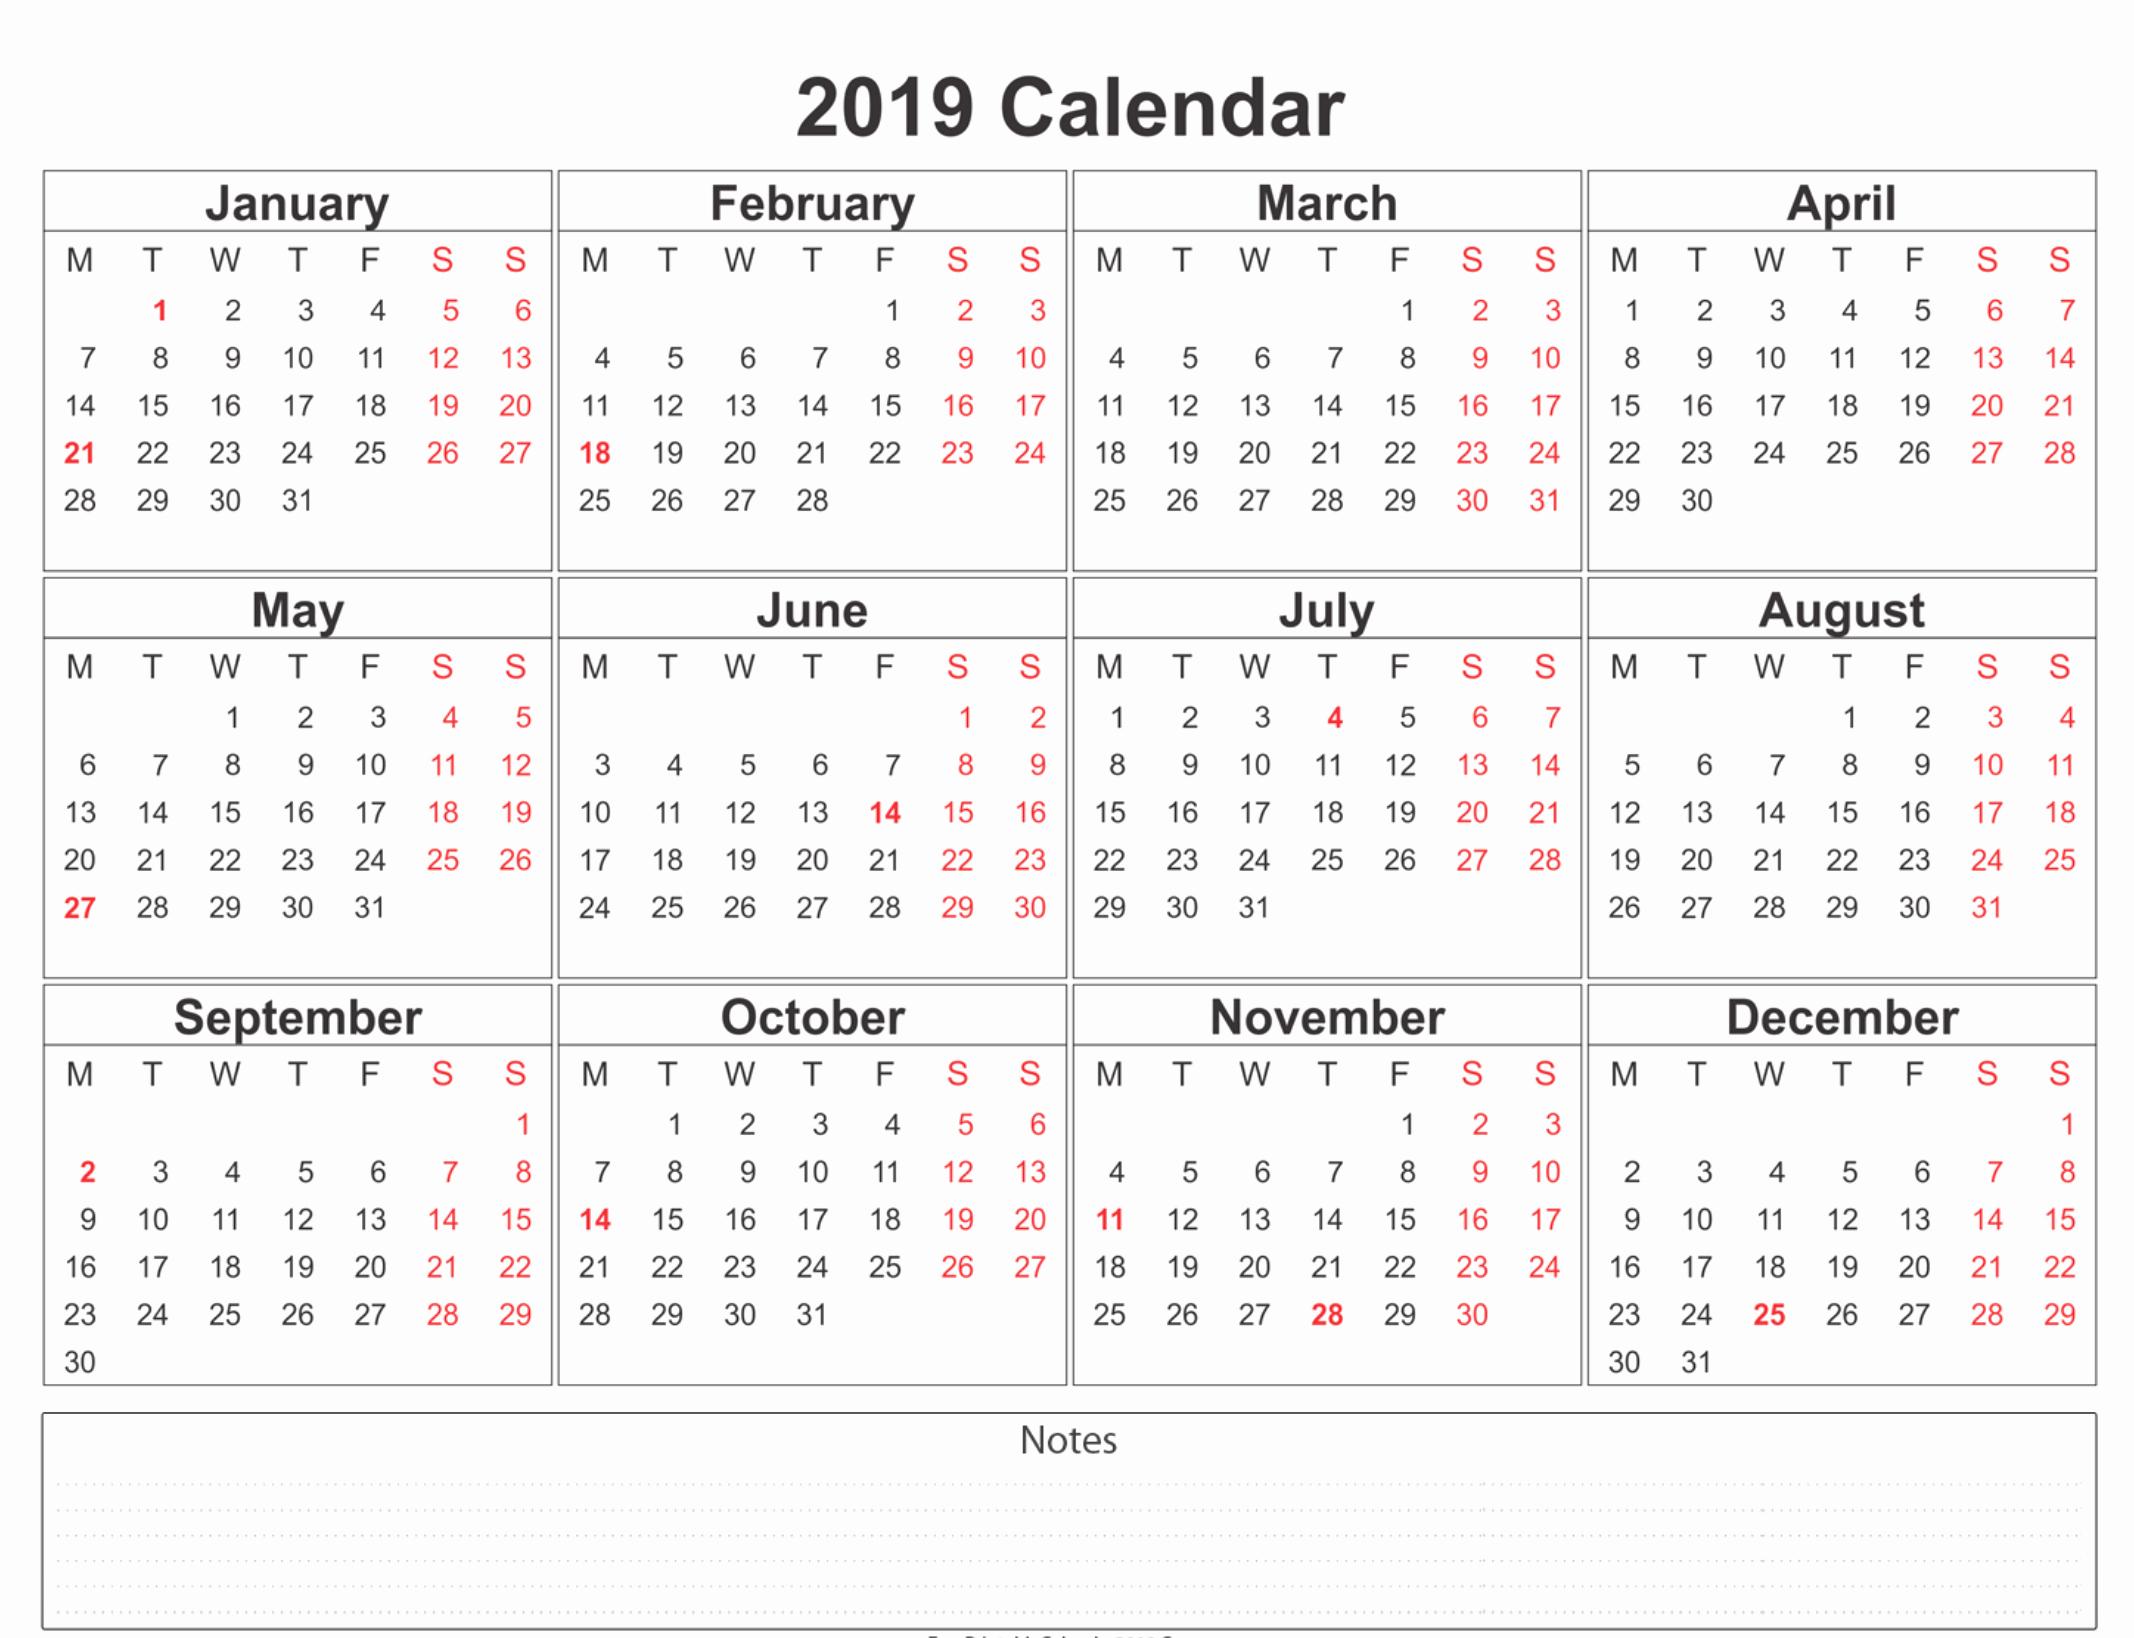 Free Printable Calendar Templates 2019 Awesome 2019 Calendar Amazonaws